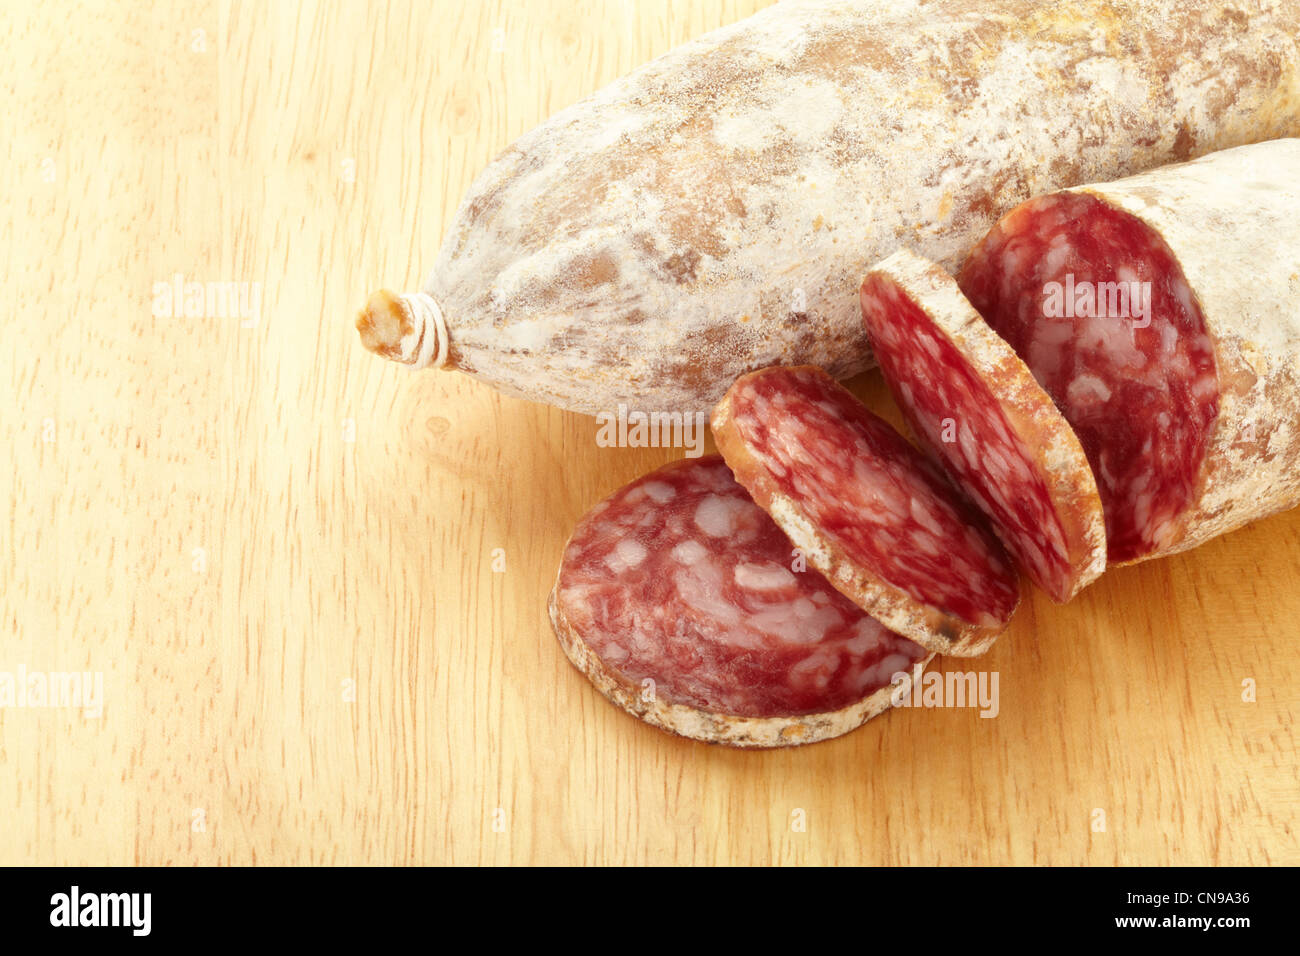 Sliced salami on cutting board - Stock Image